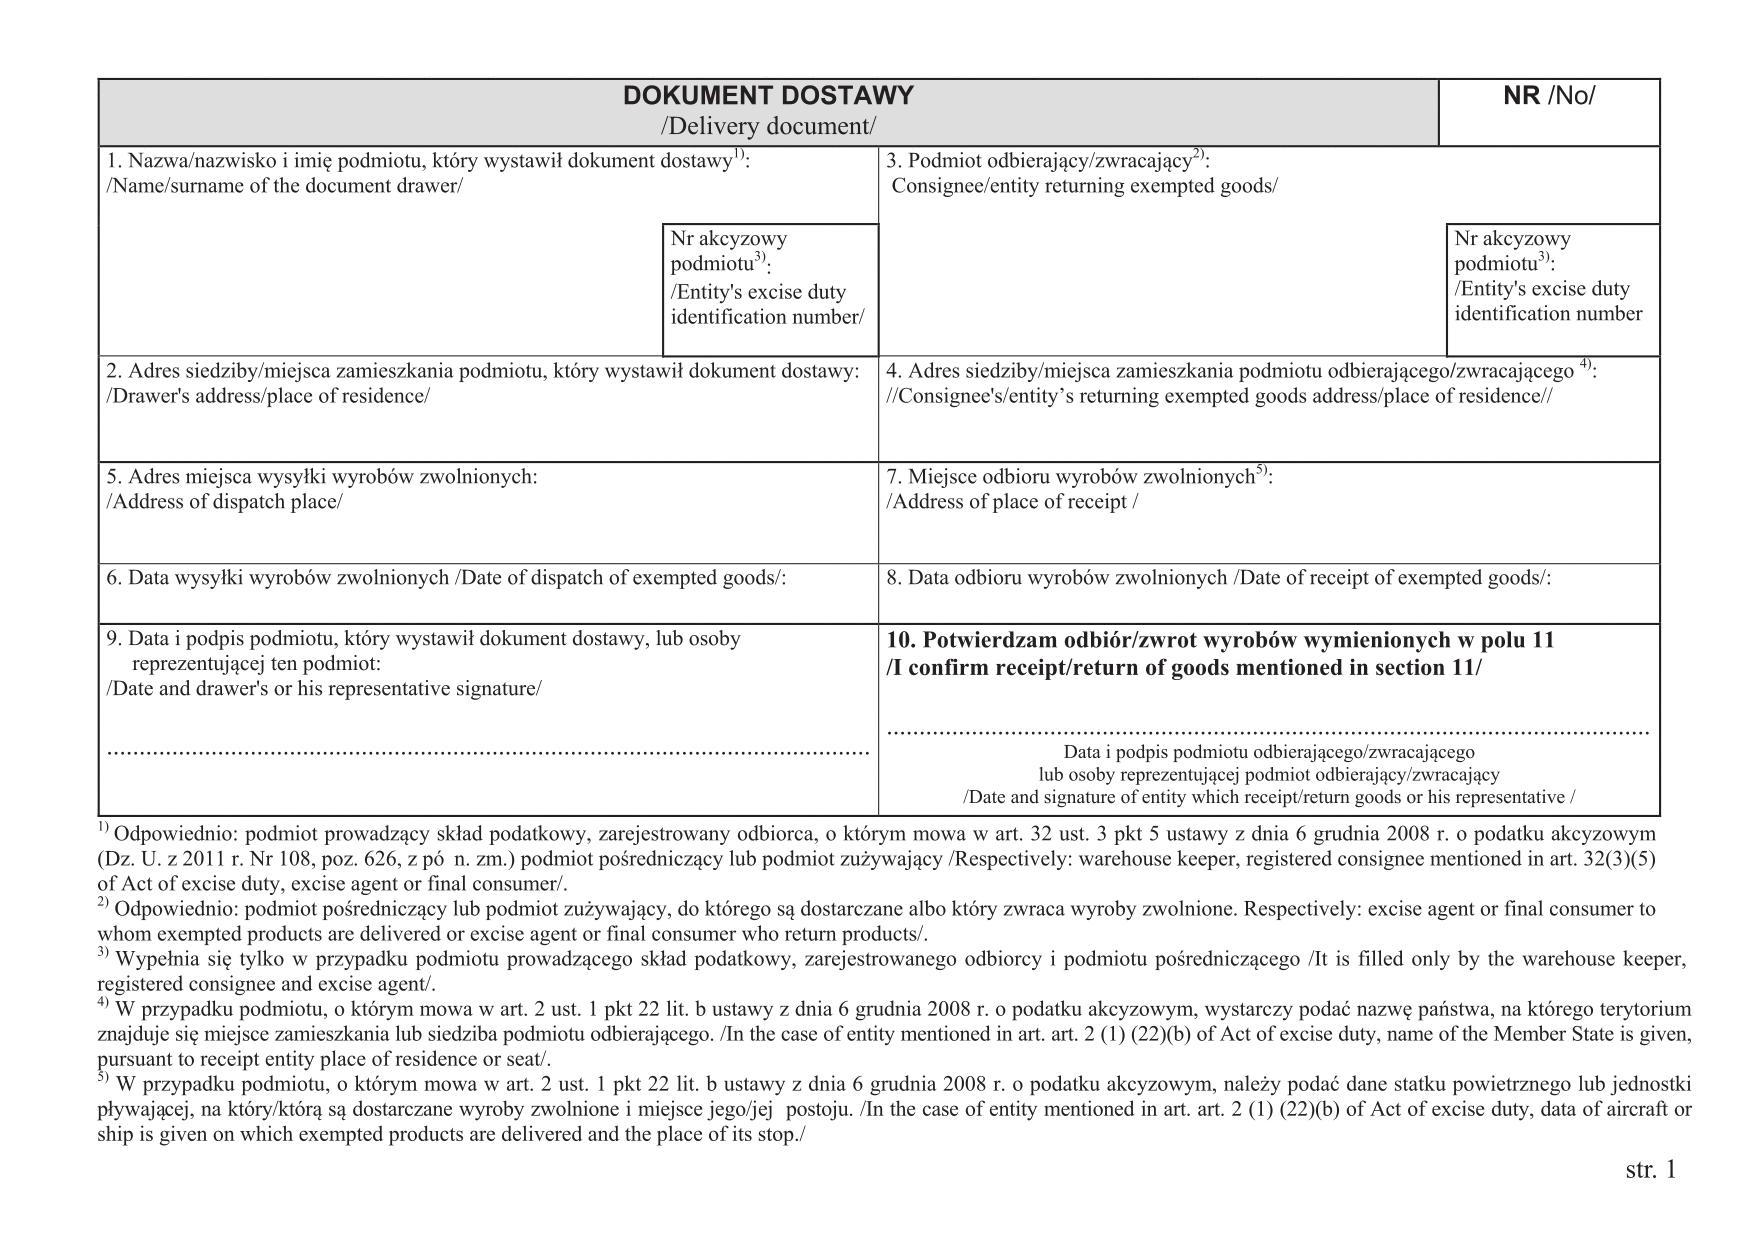 DD Dokument dostawy